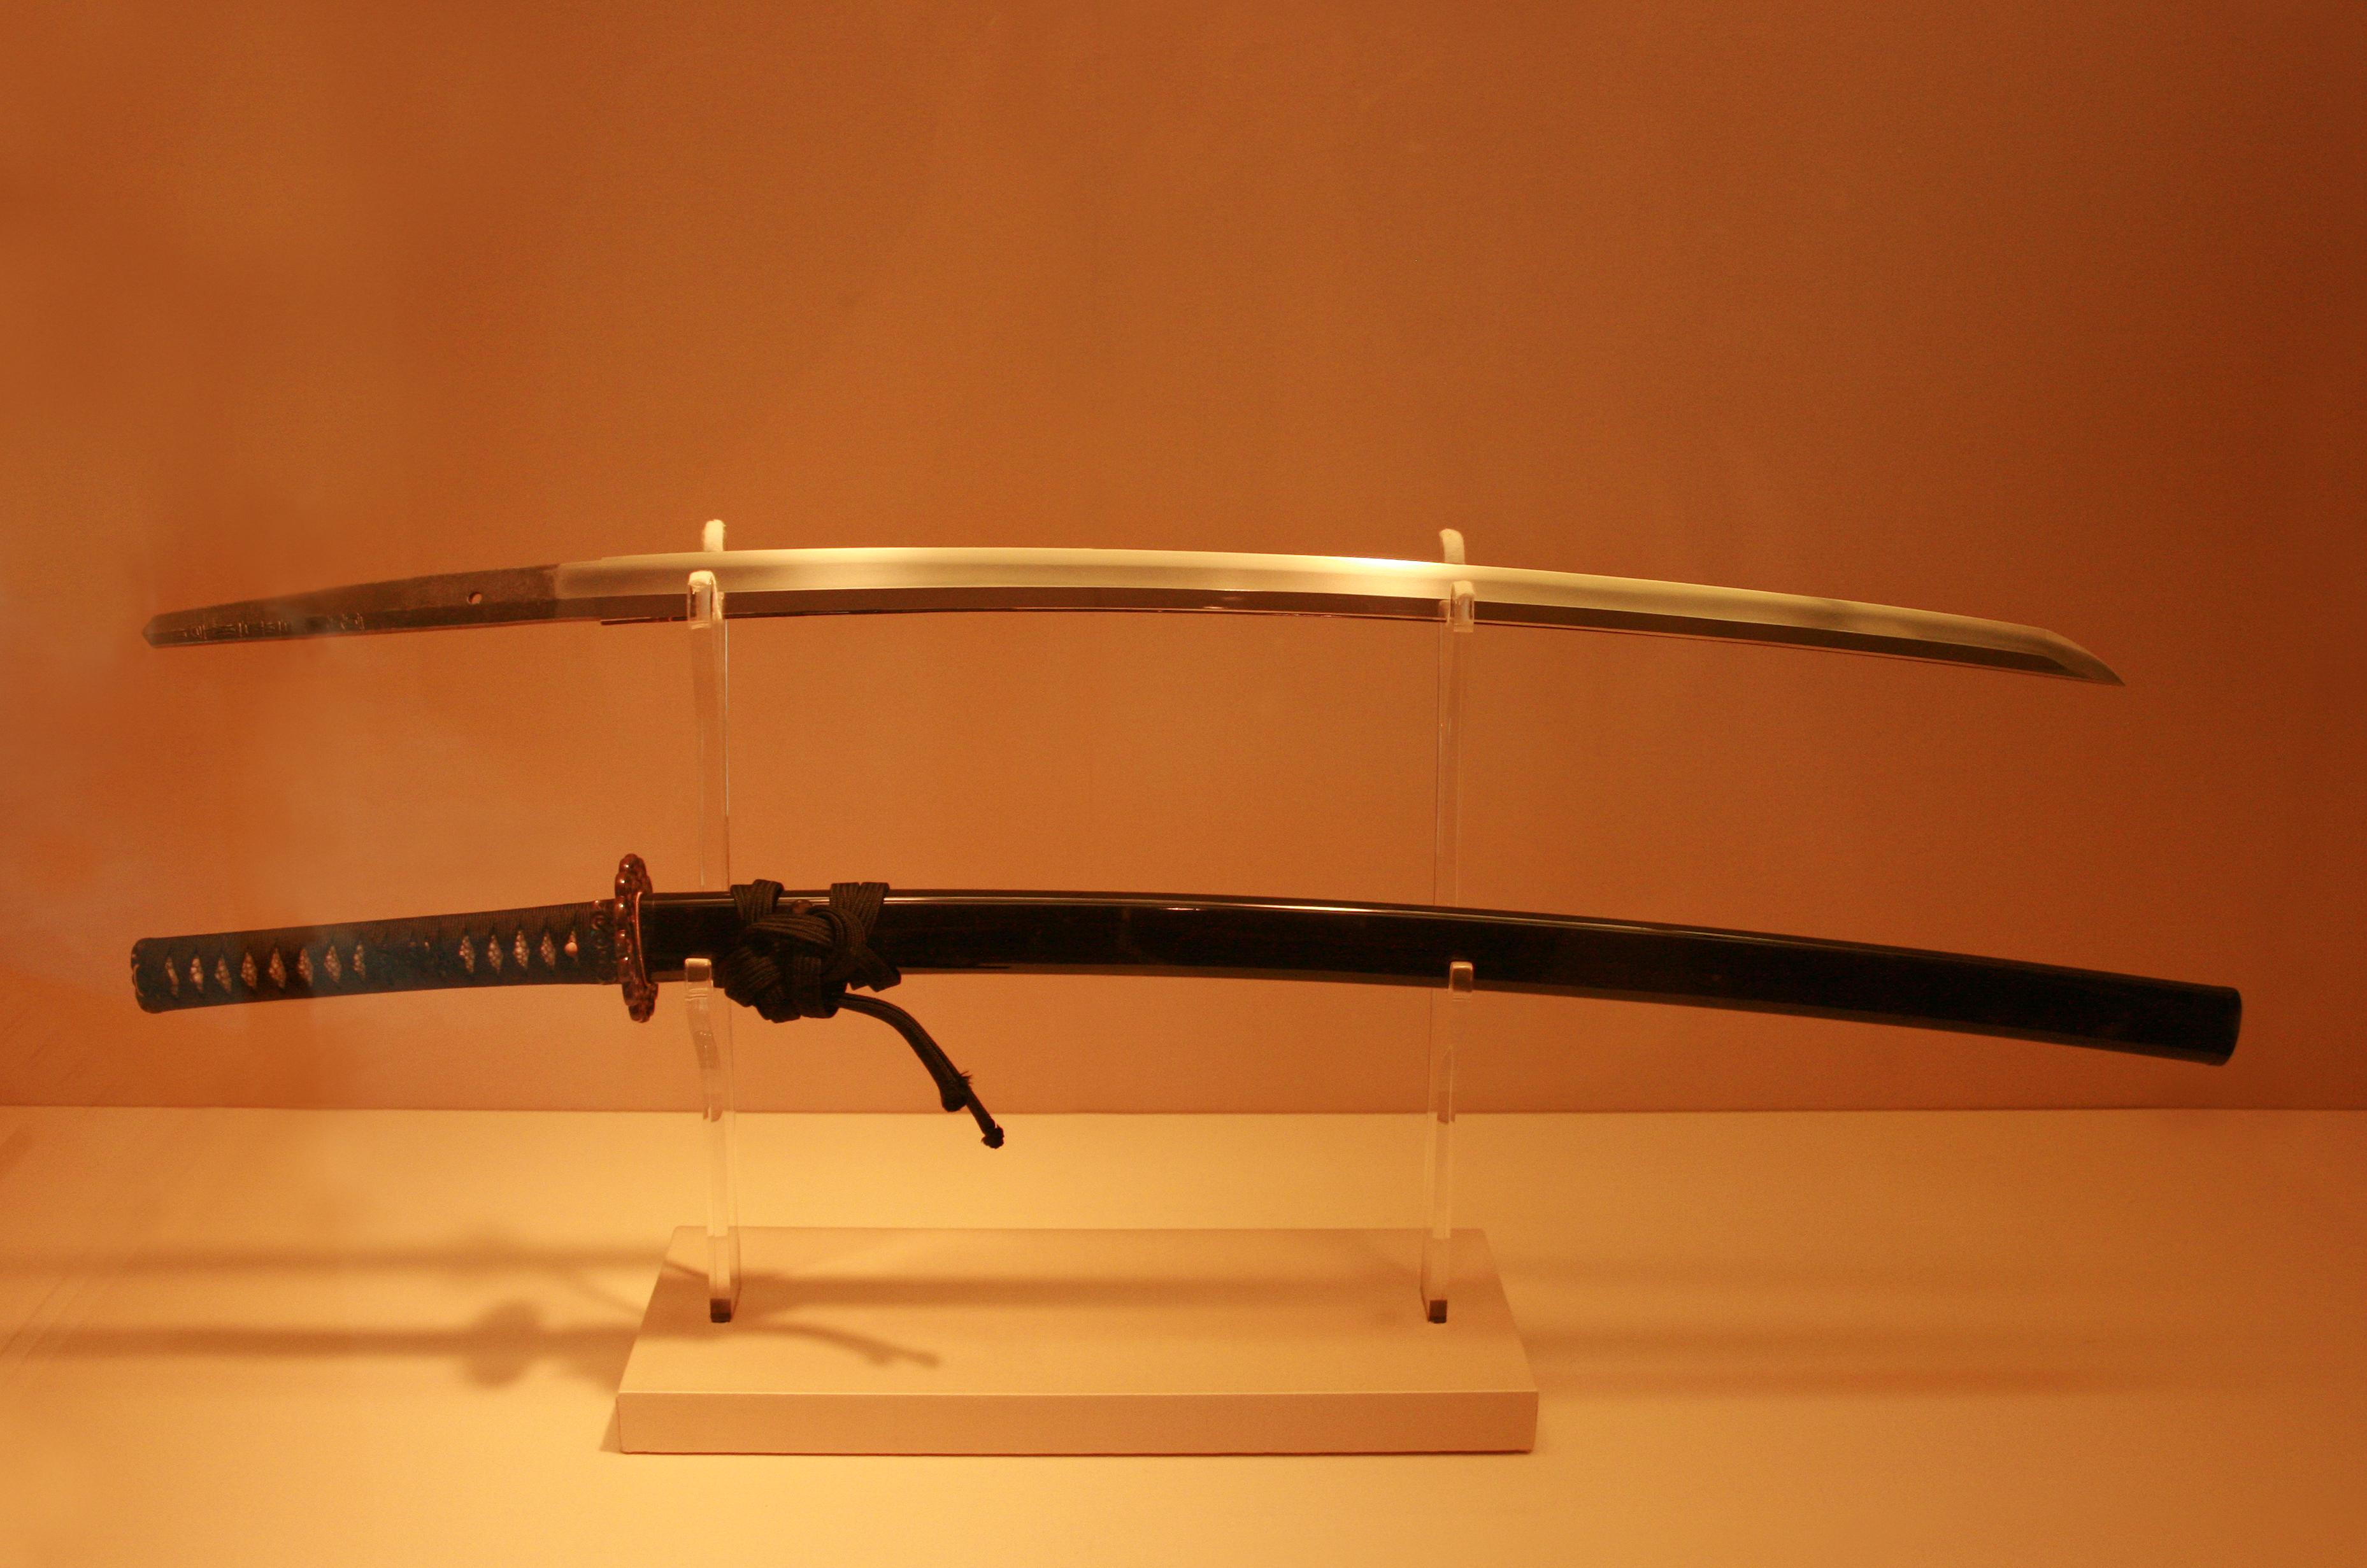 https://upload.wikimedia.org/wikipedia/commons/d/d9/Antique_Japanese_%28samurai%29_katana_met_museum.jpg